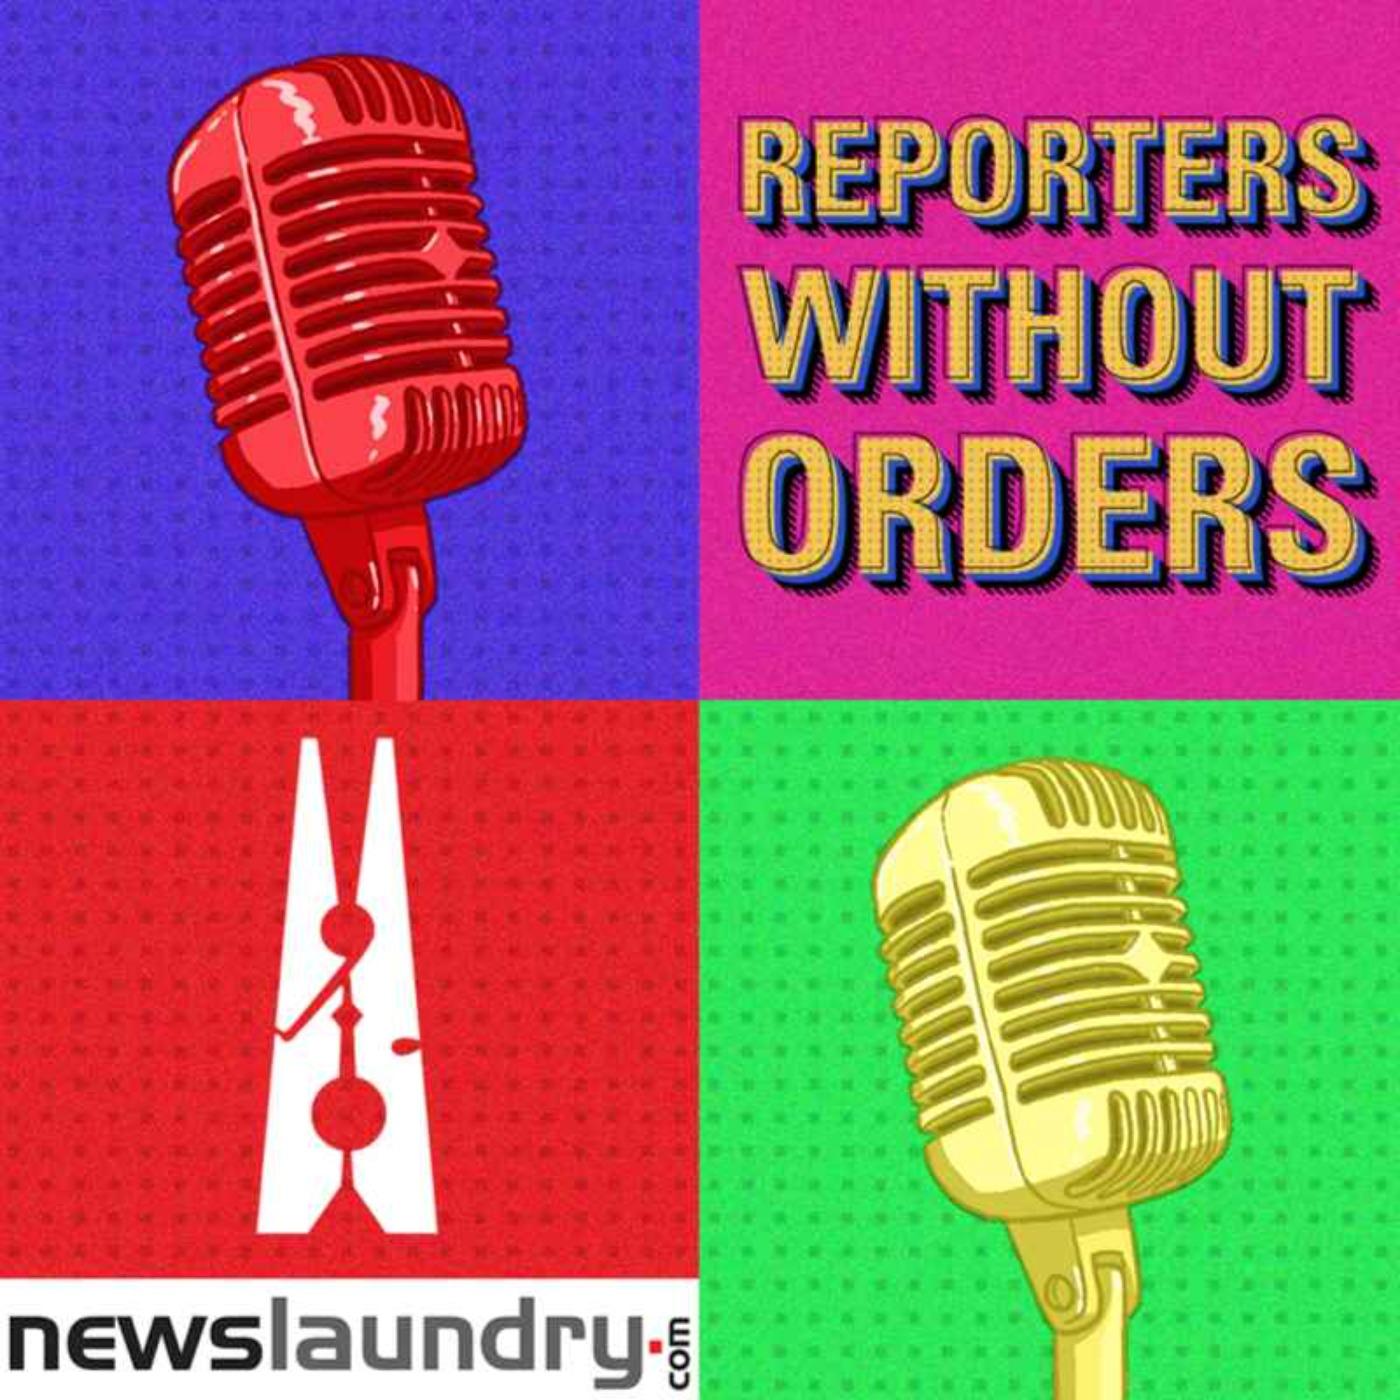 Reporters Without Orders Ep 170: Tejasvi Surya row, Dainik Jagran on farm laws, Rajasthan vaccine wastage